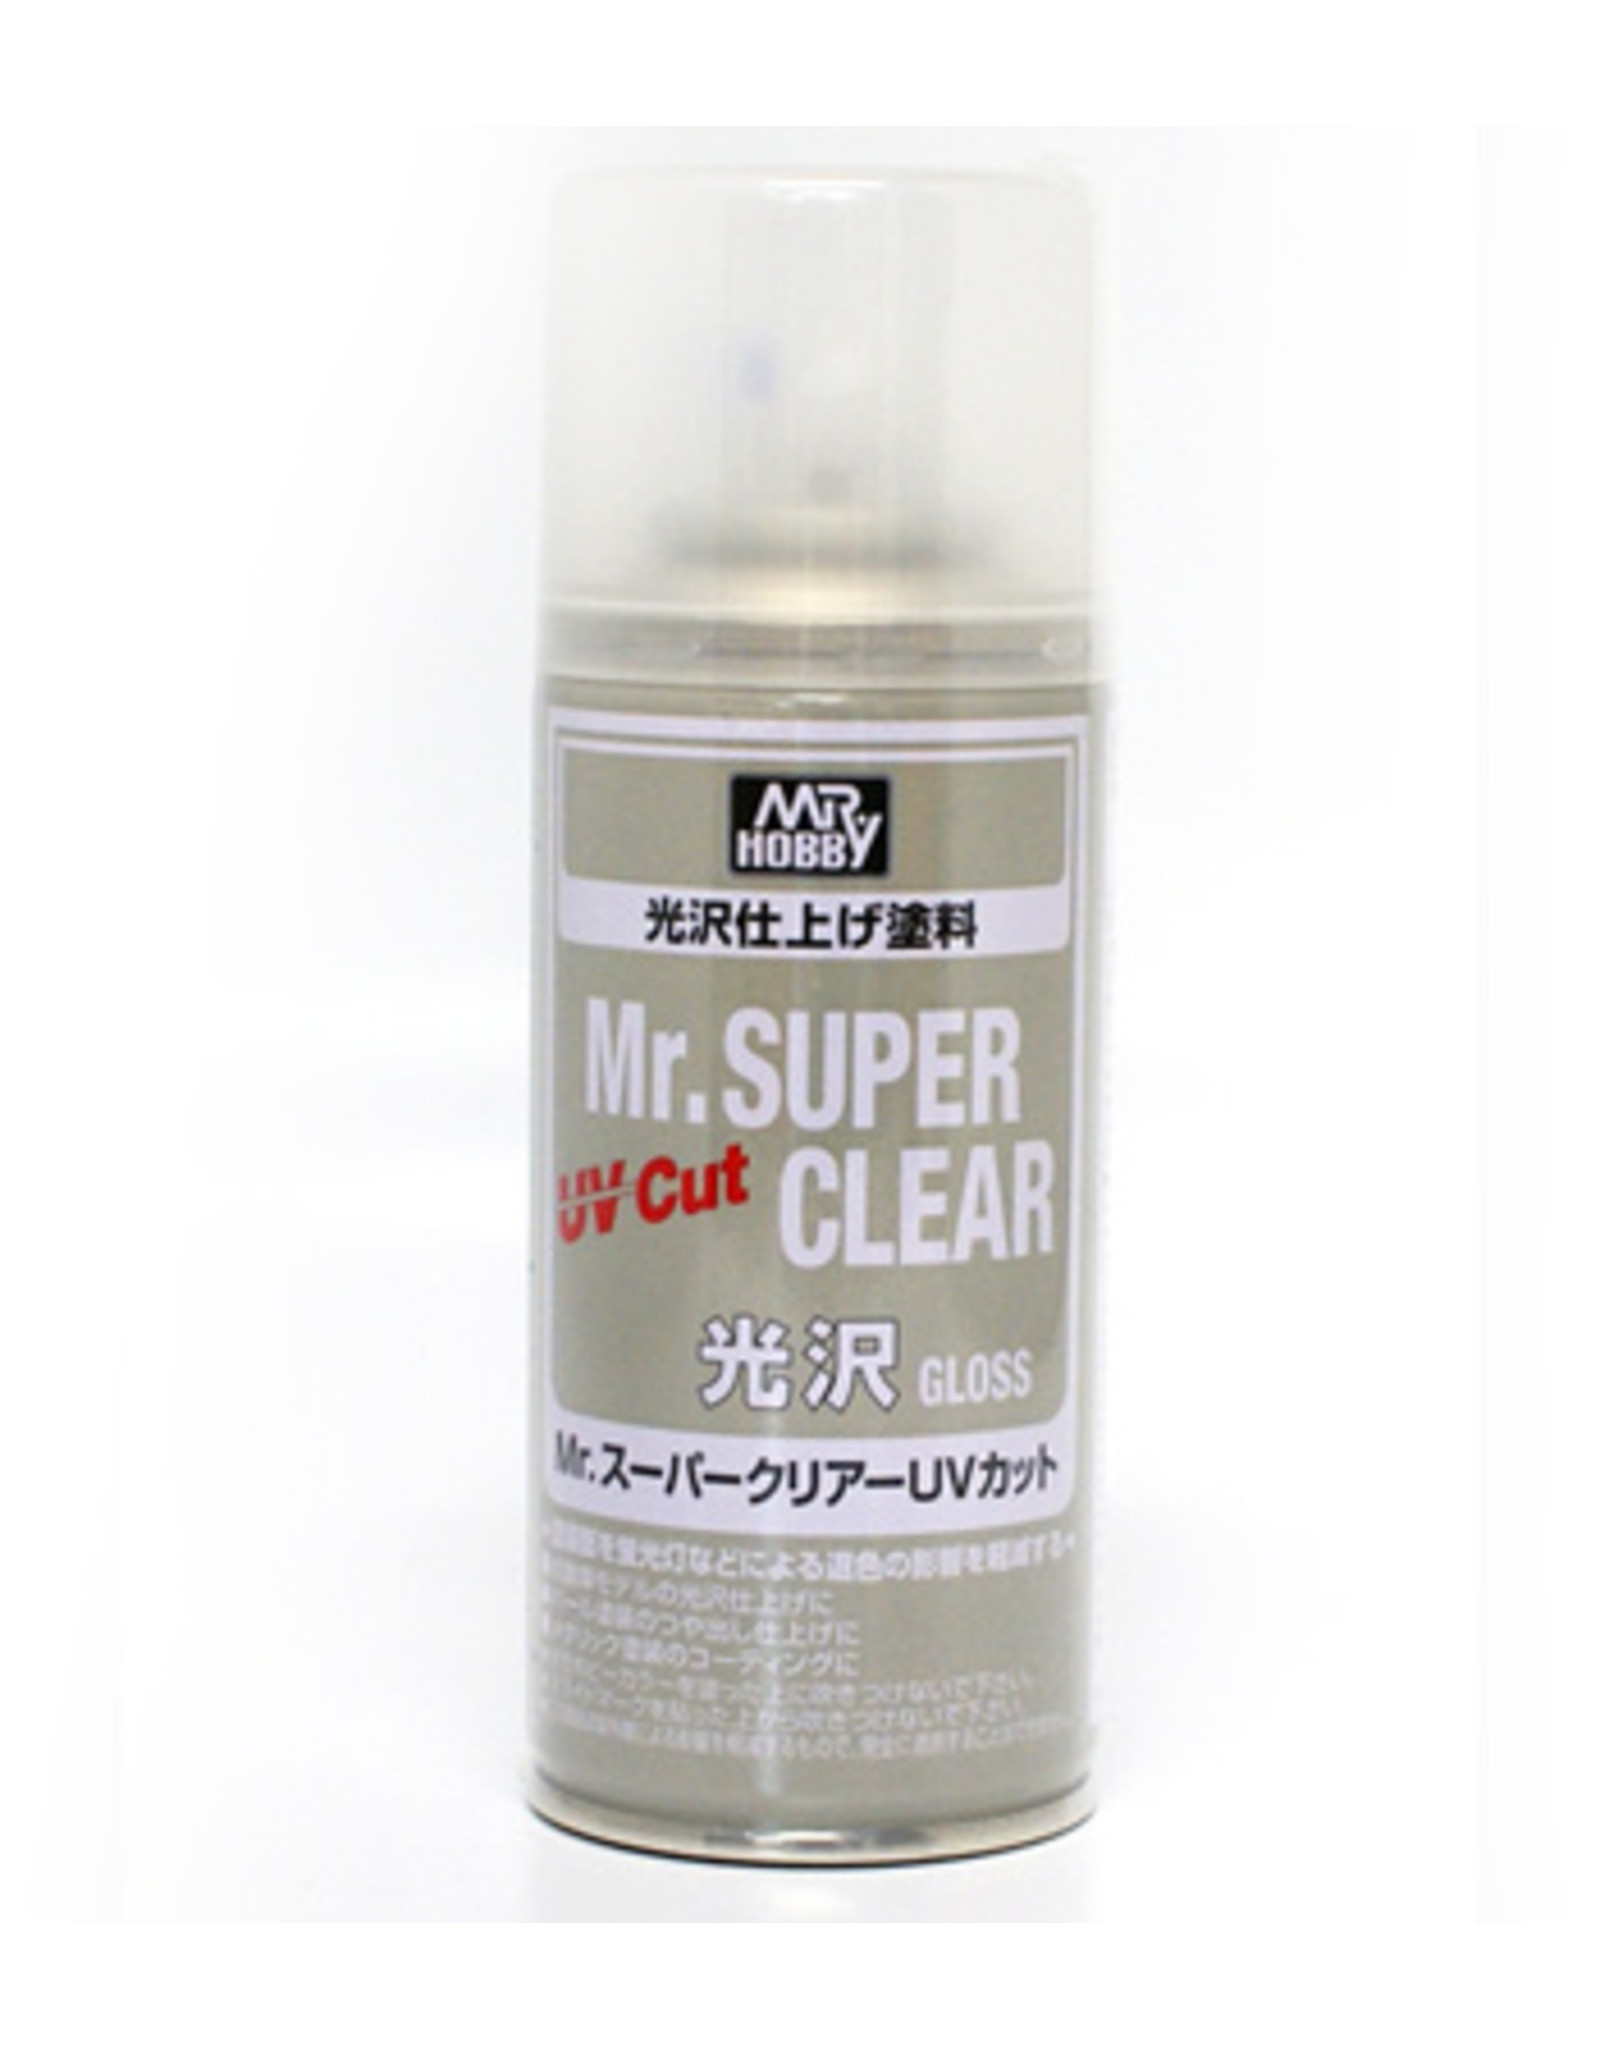 B522 Mr Super Clear Uv Cut Gloss Spray Can Hub Hobby